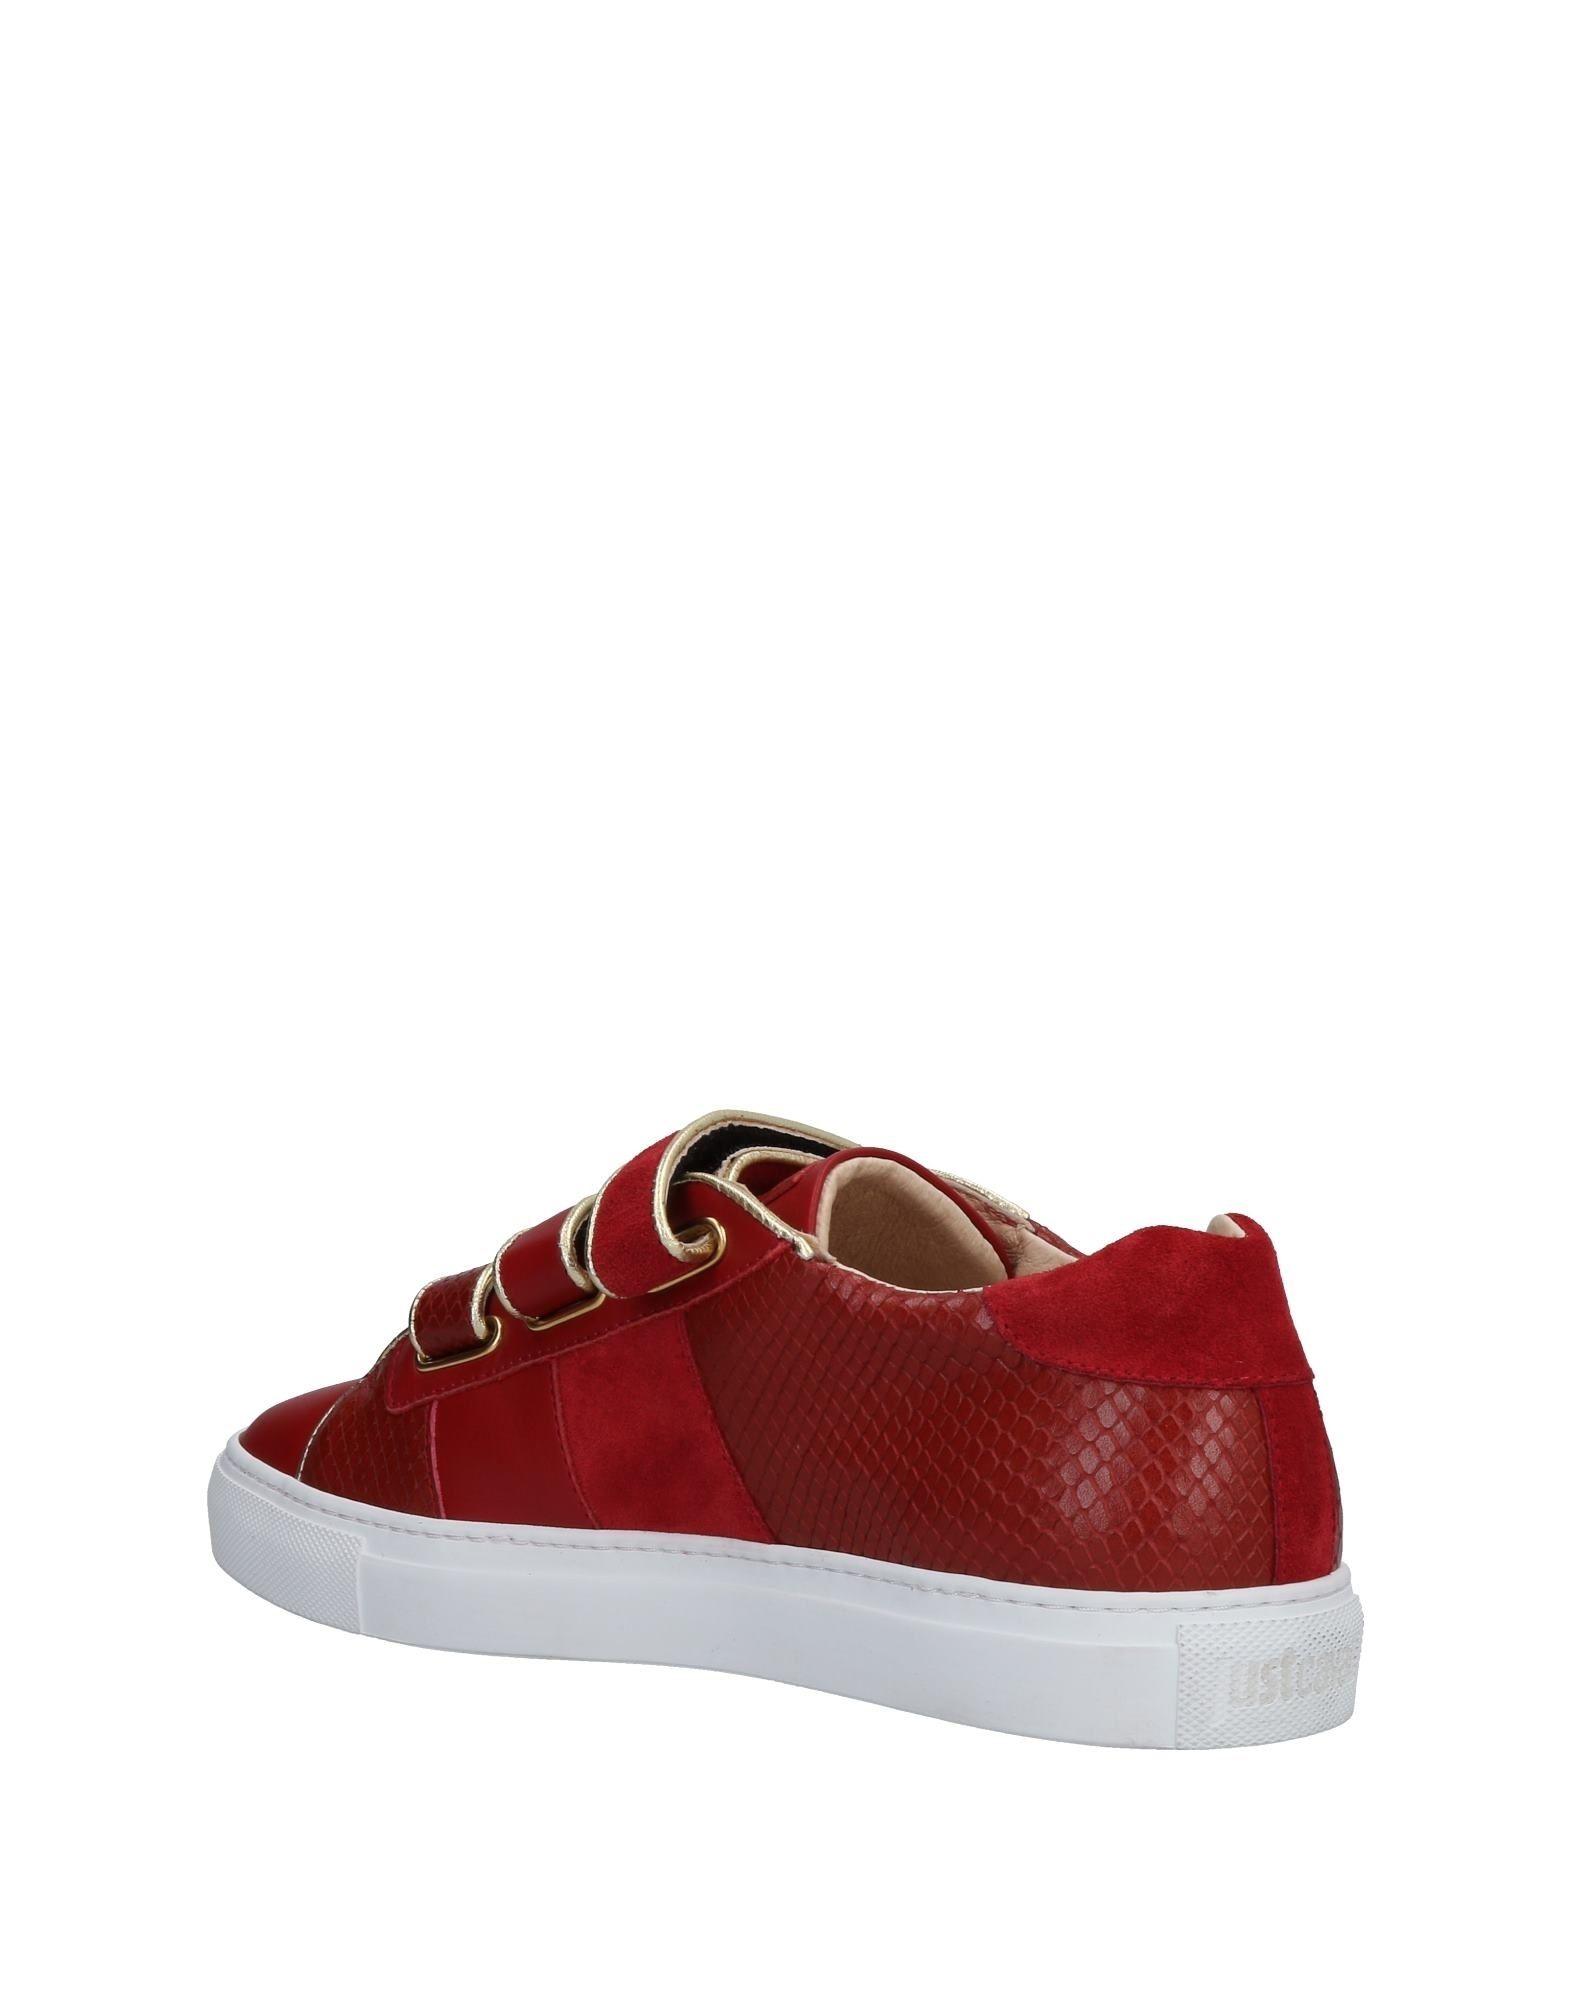 Just Cavalli Cavalli Just Sneakers Herren  11469997HC 7d51af